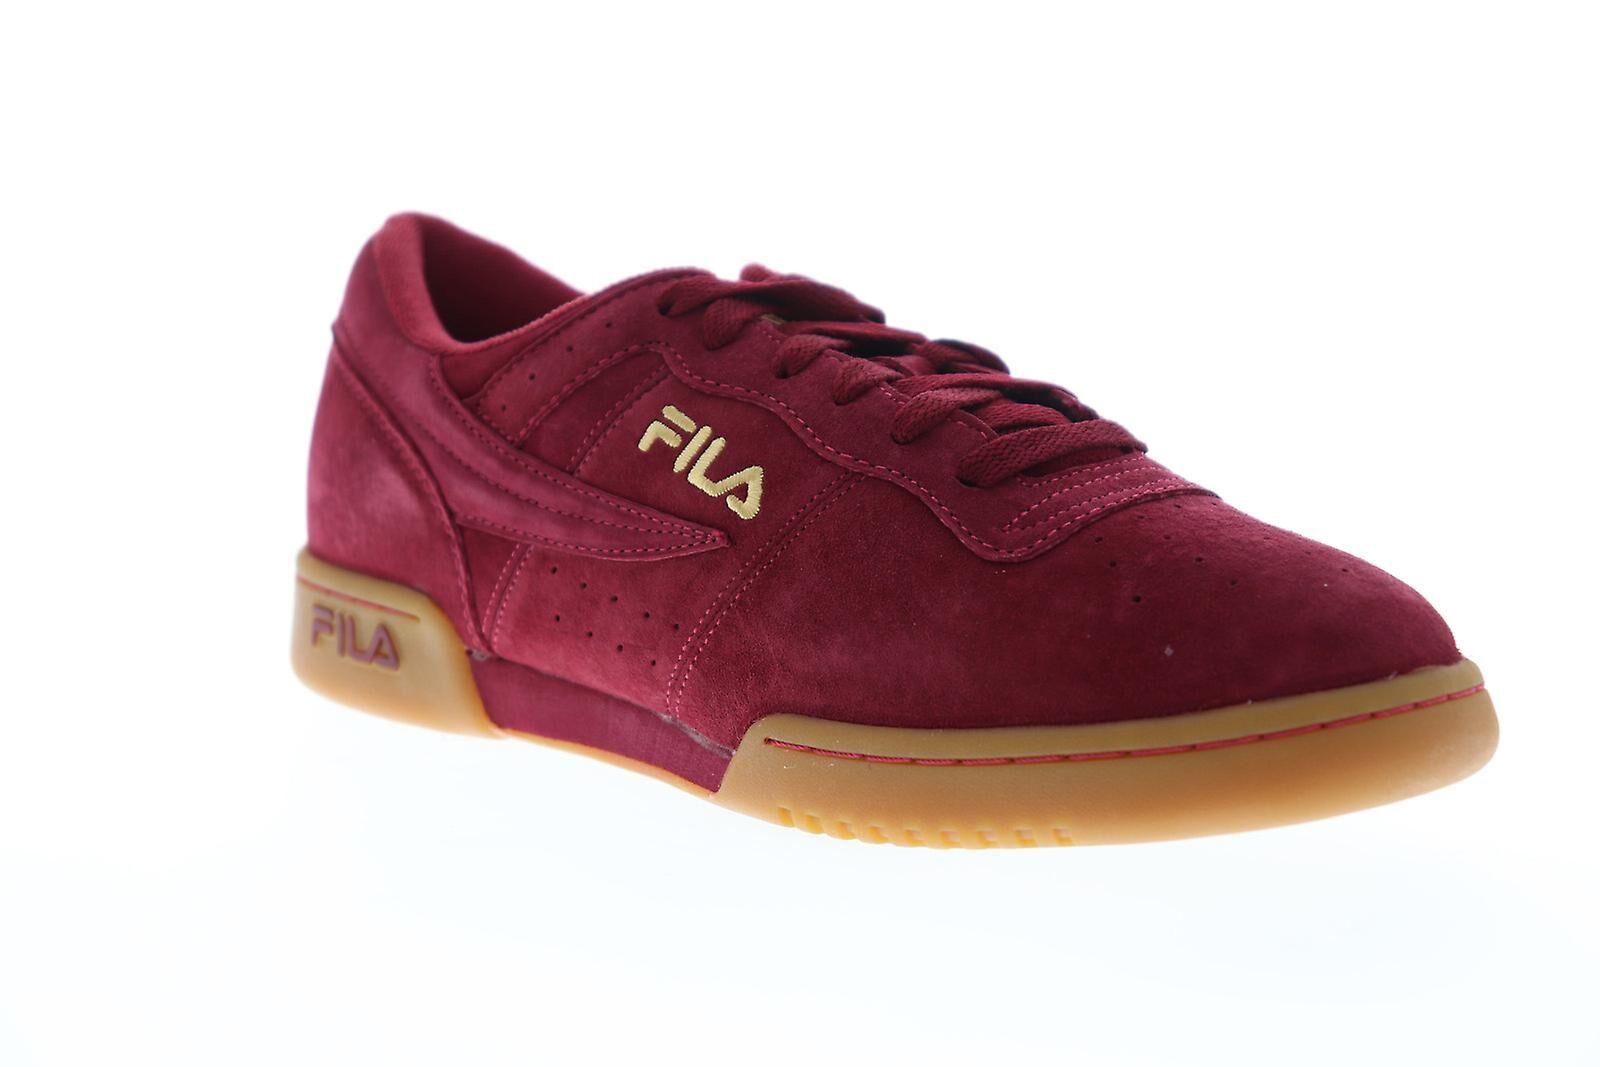 Fila Original Fitness Premium Homme Rouge Suede Casual Low Top Snea...